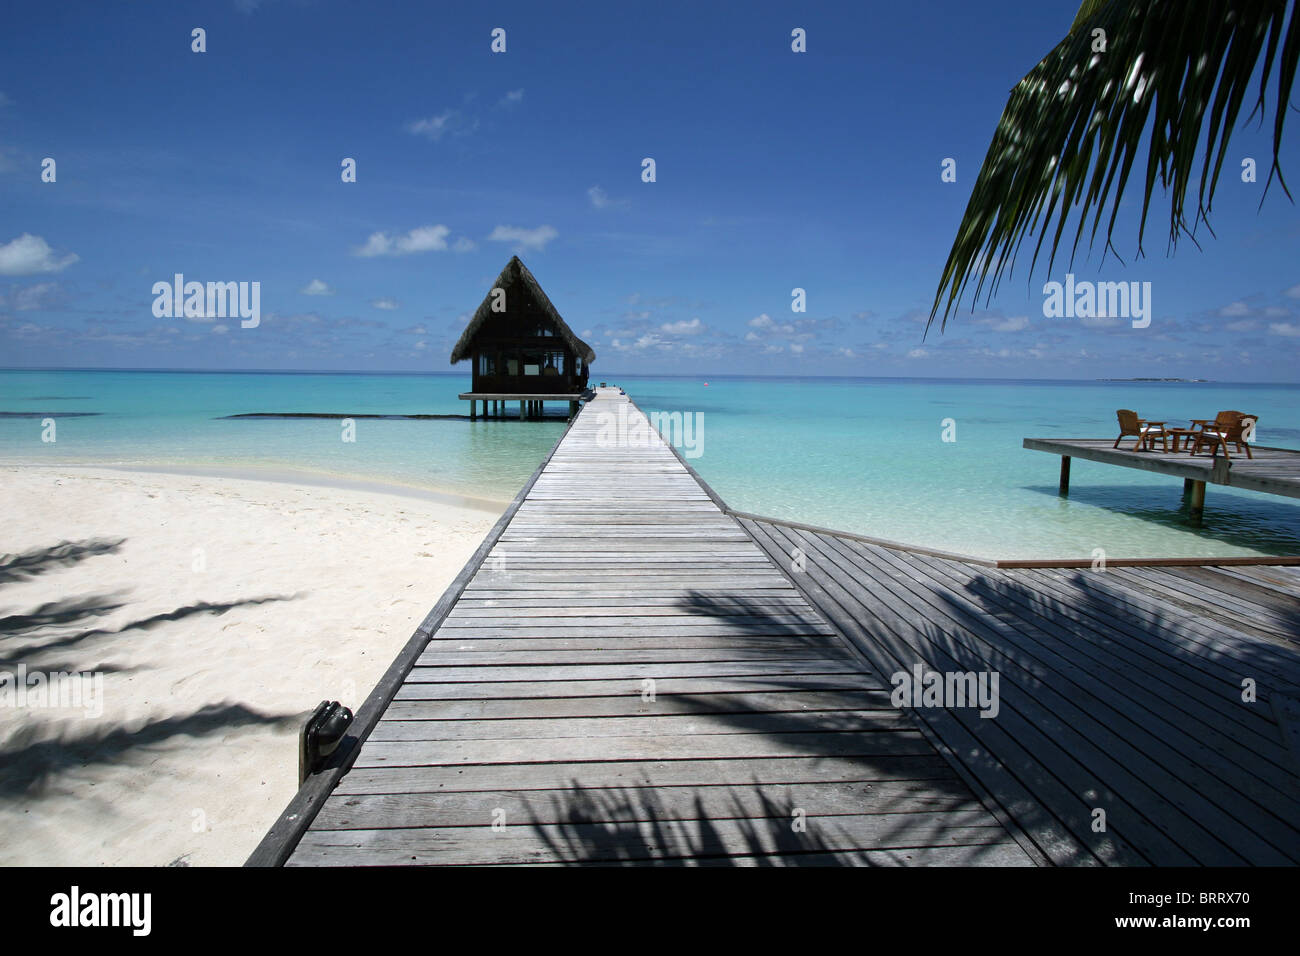 A Beach Bar Scene on Kuramathi, a tropical island resort on the Maldives Stock Photo